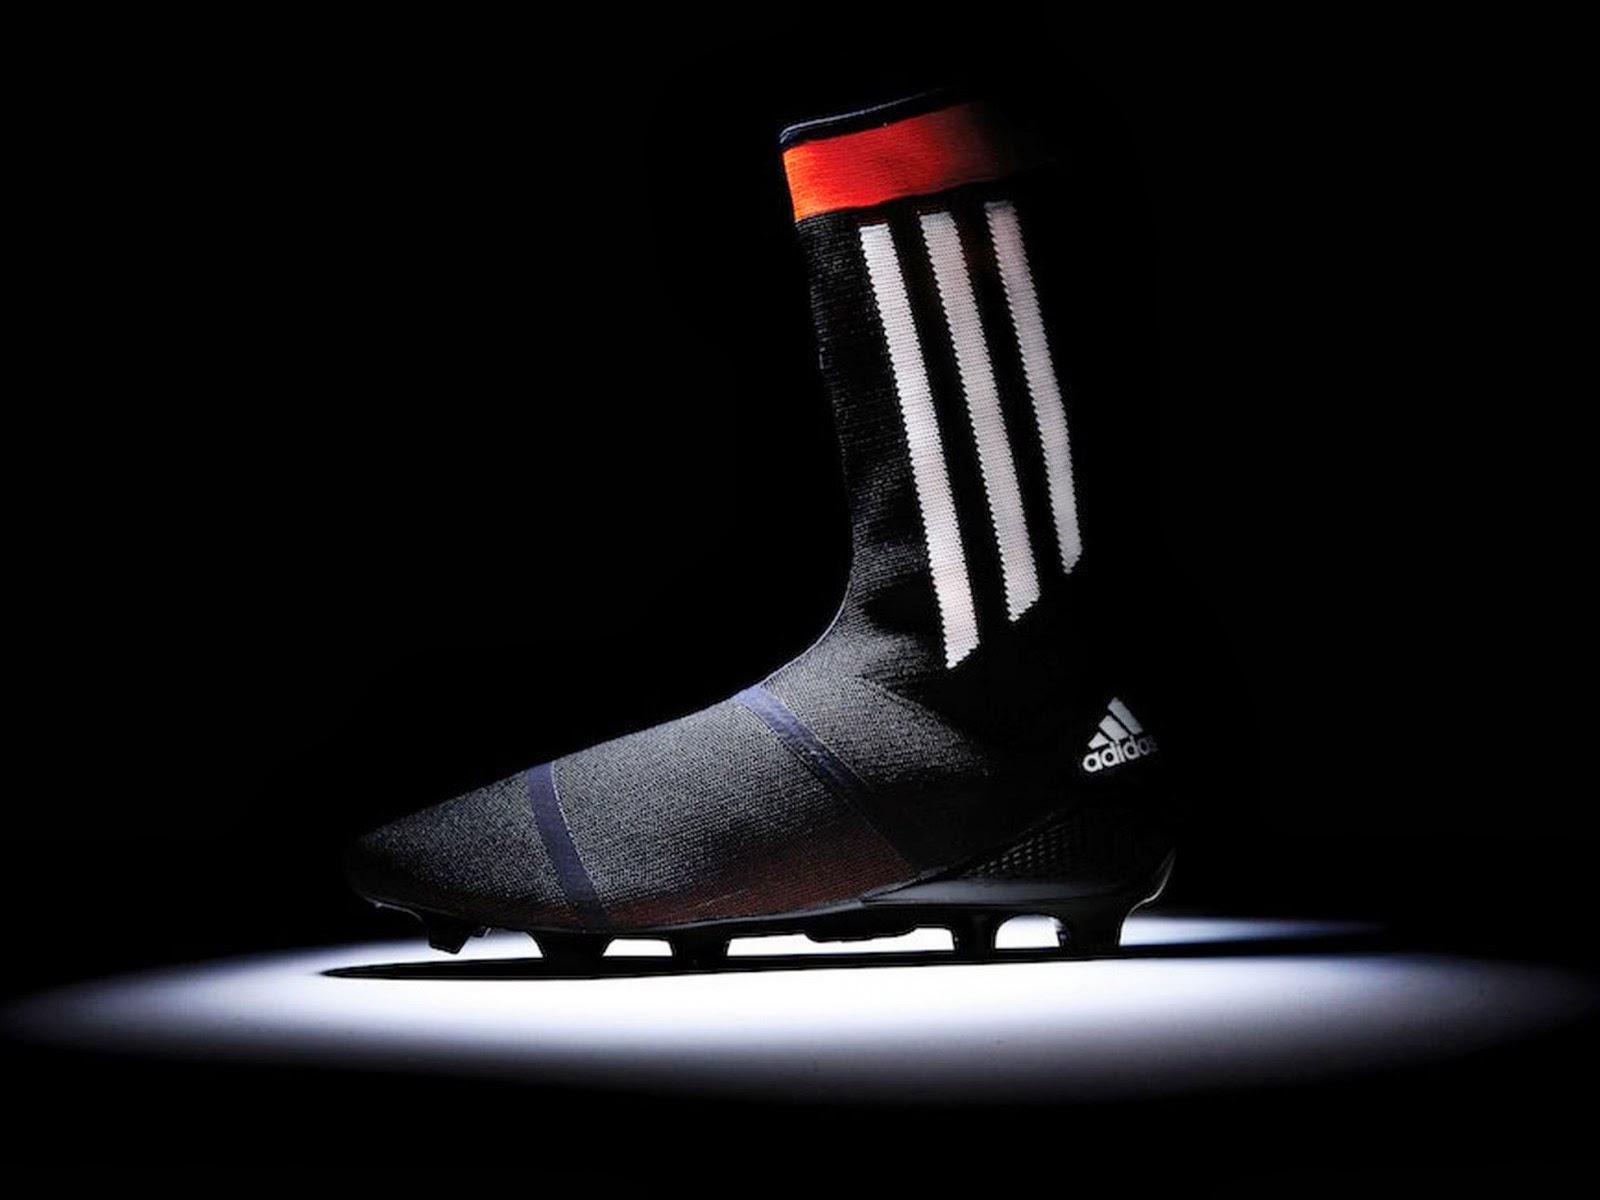 Adidas primeknit fs 2014 football boot hd desktop - Adidas football hd wallpapers ...